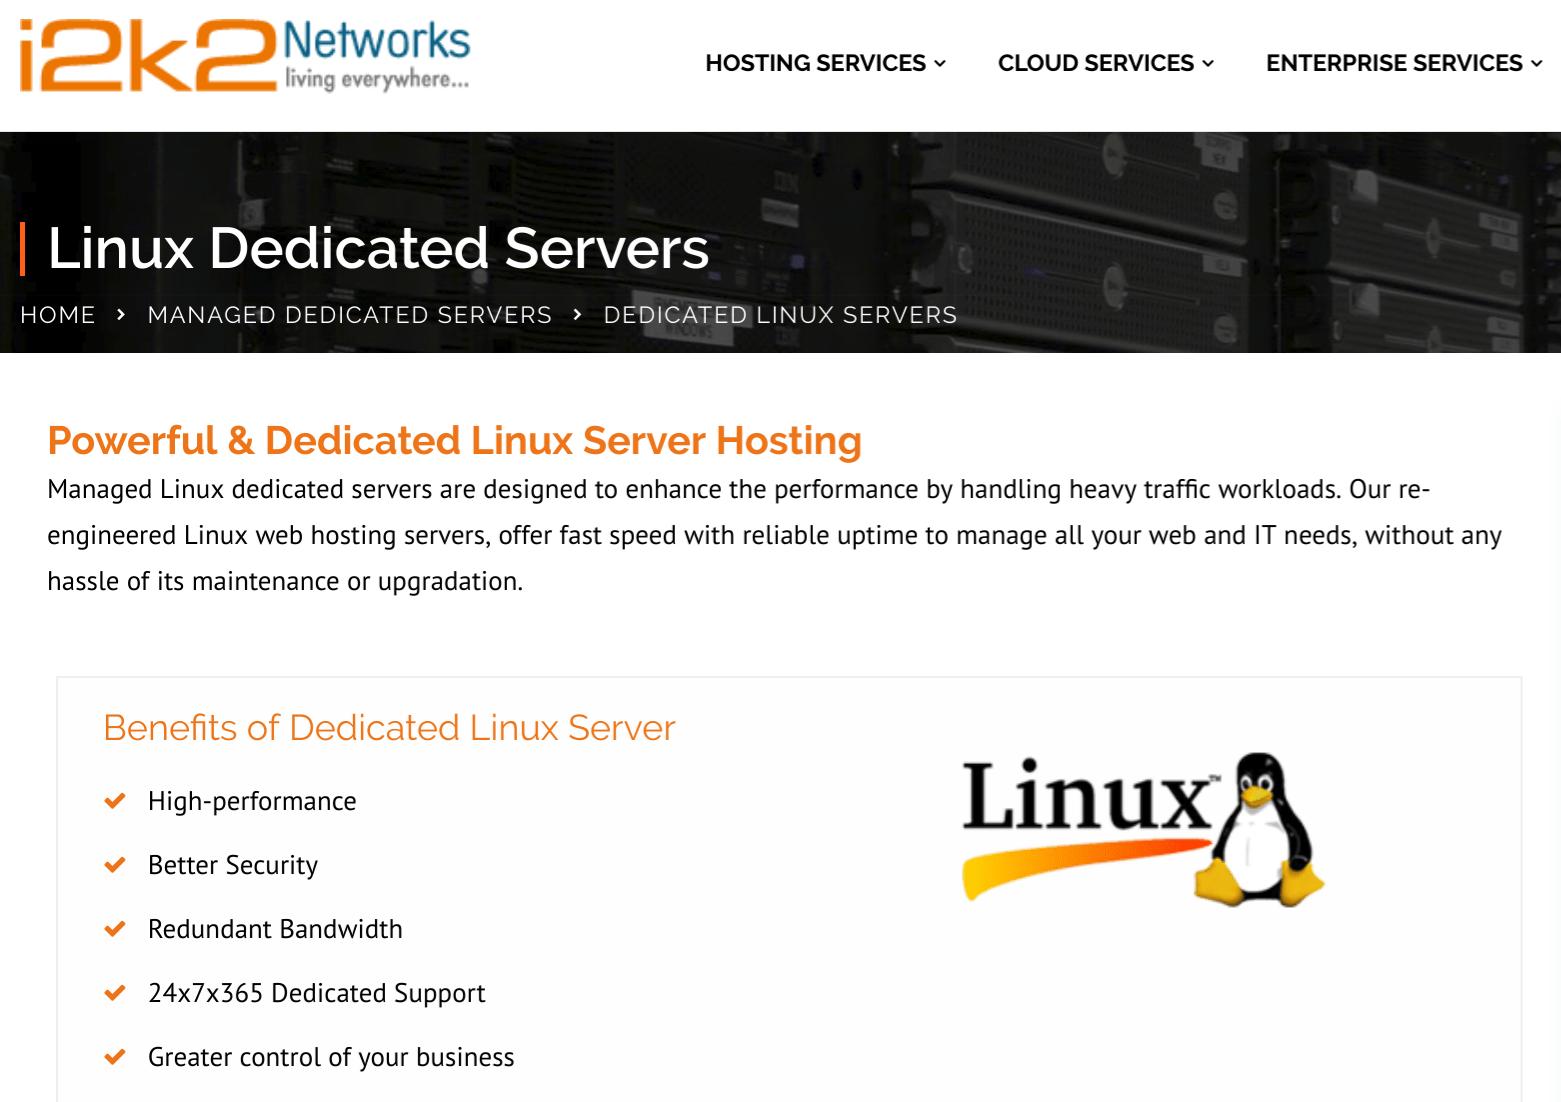 i2k2-Networks-overview1